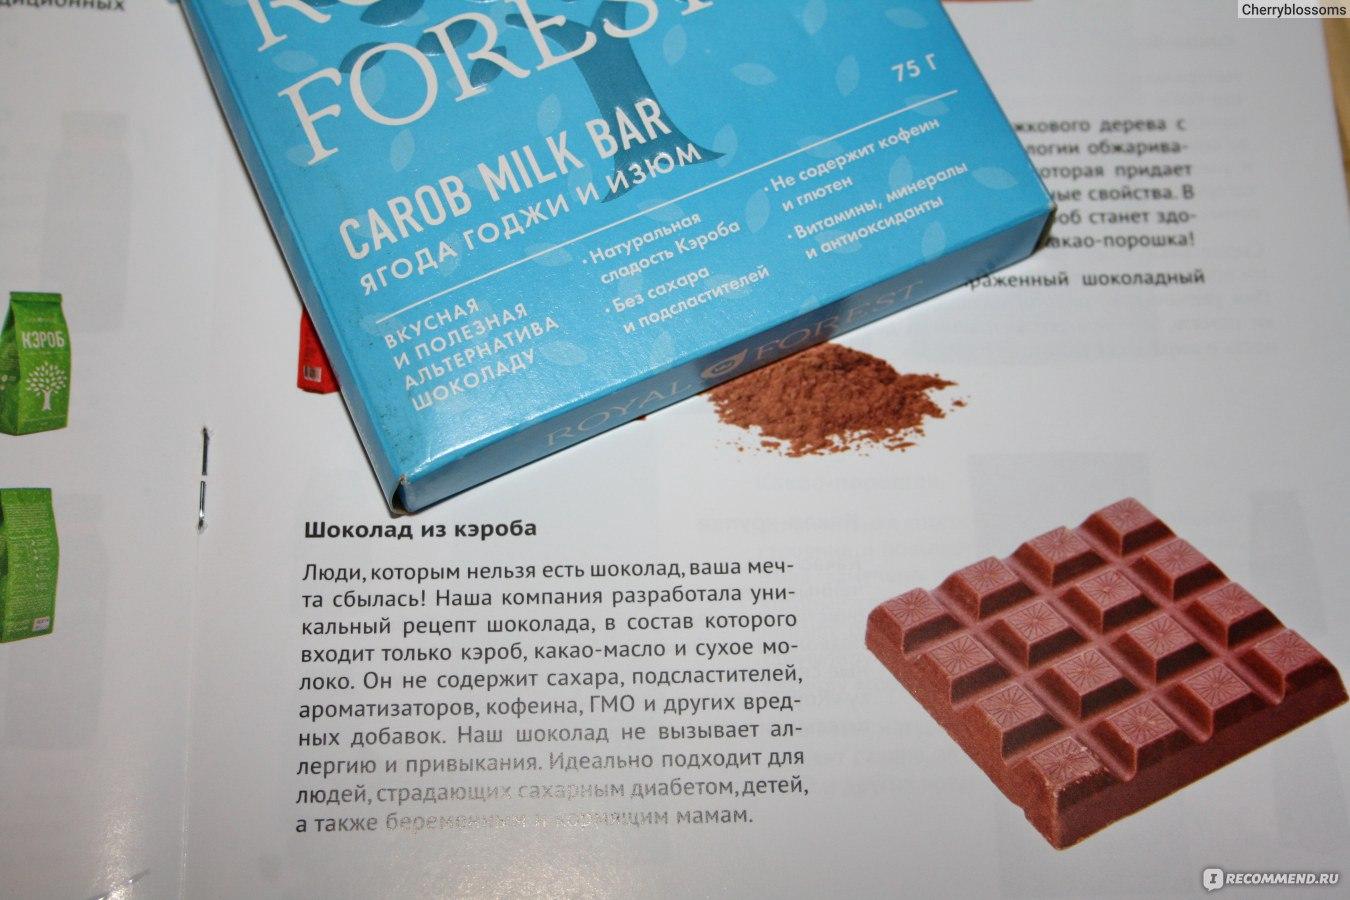 Шоколад из кэроба с какао маслом